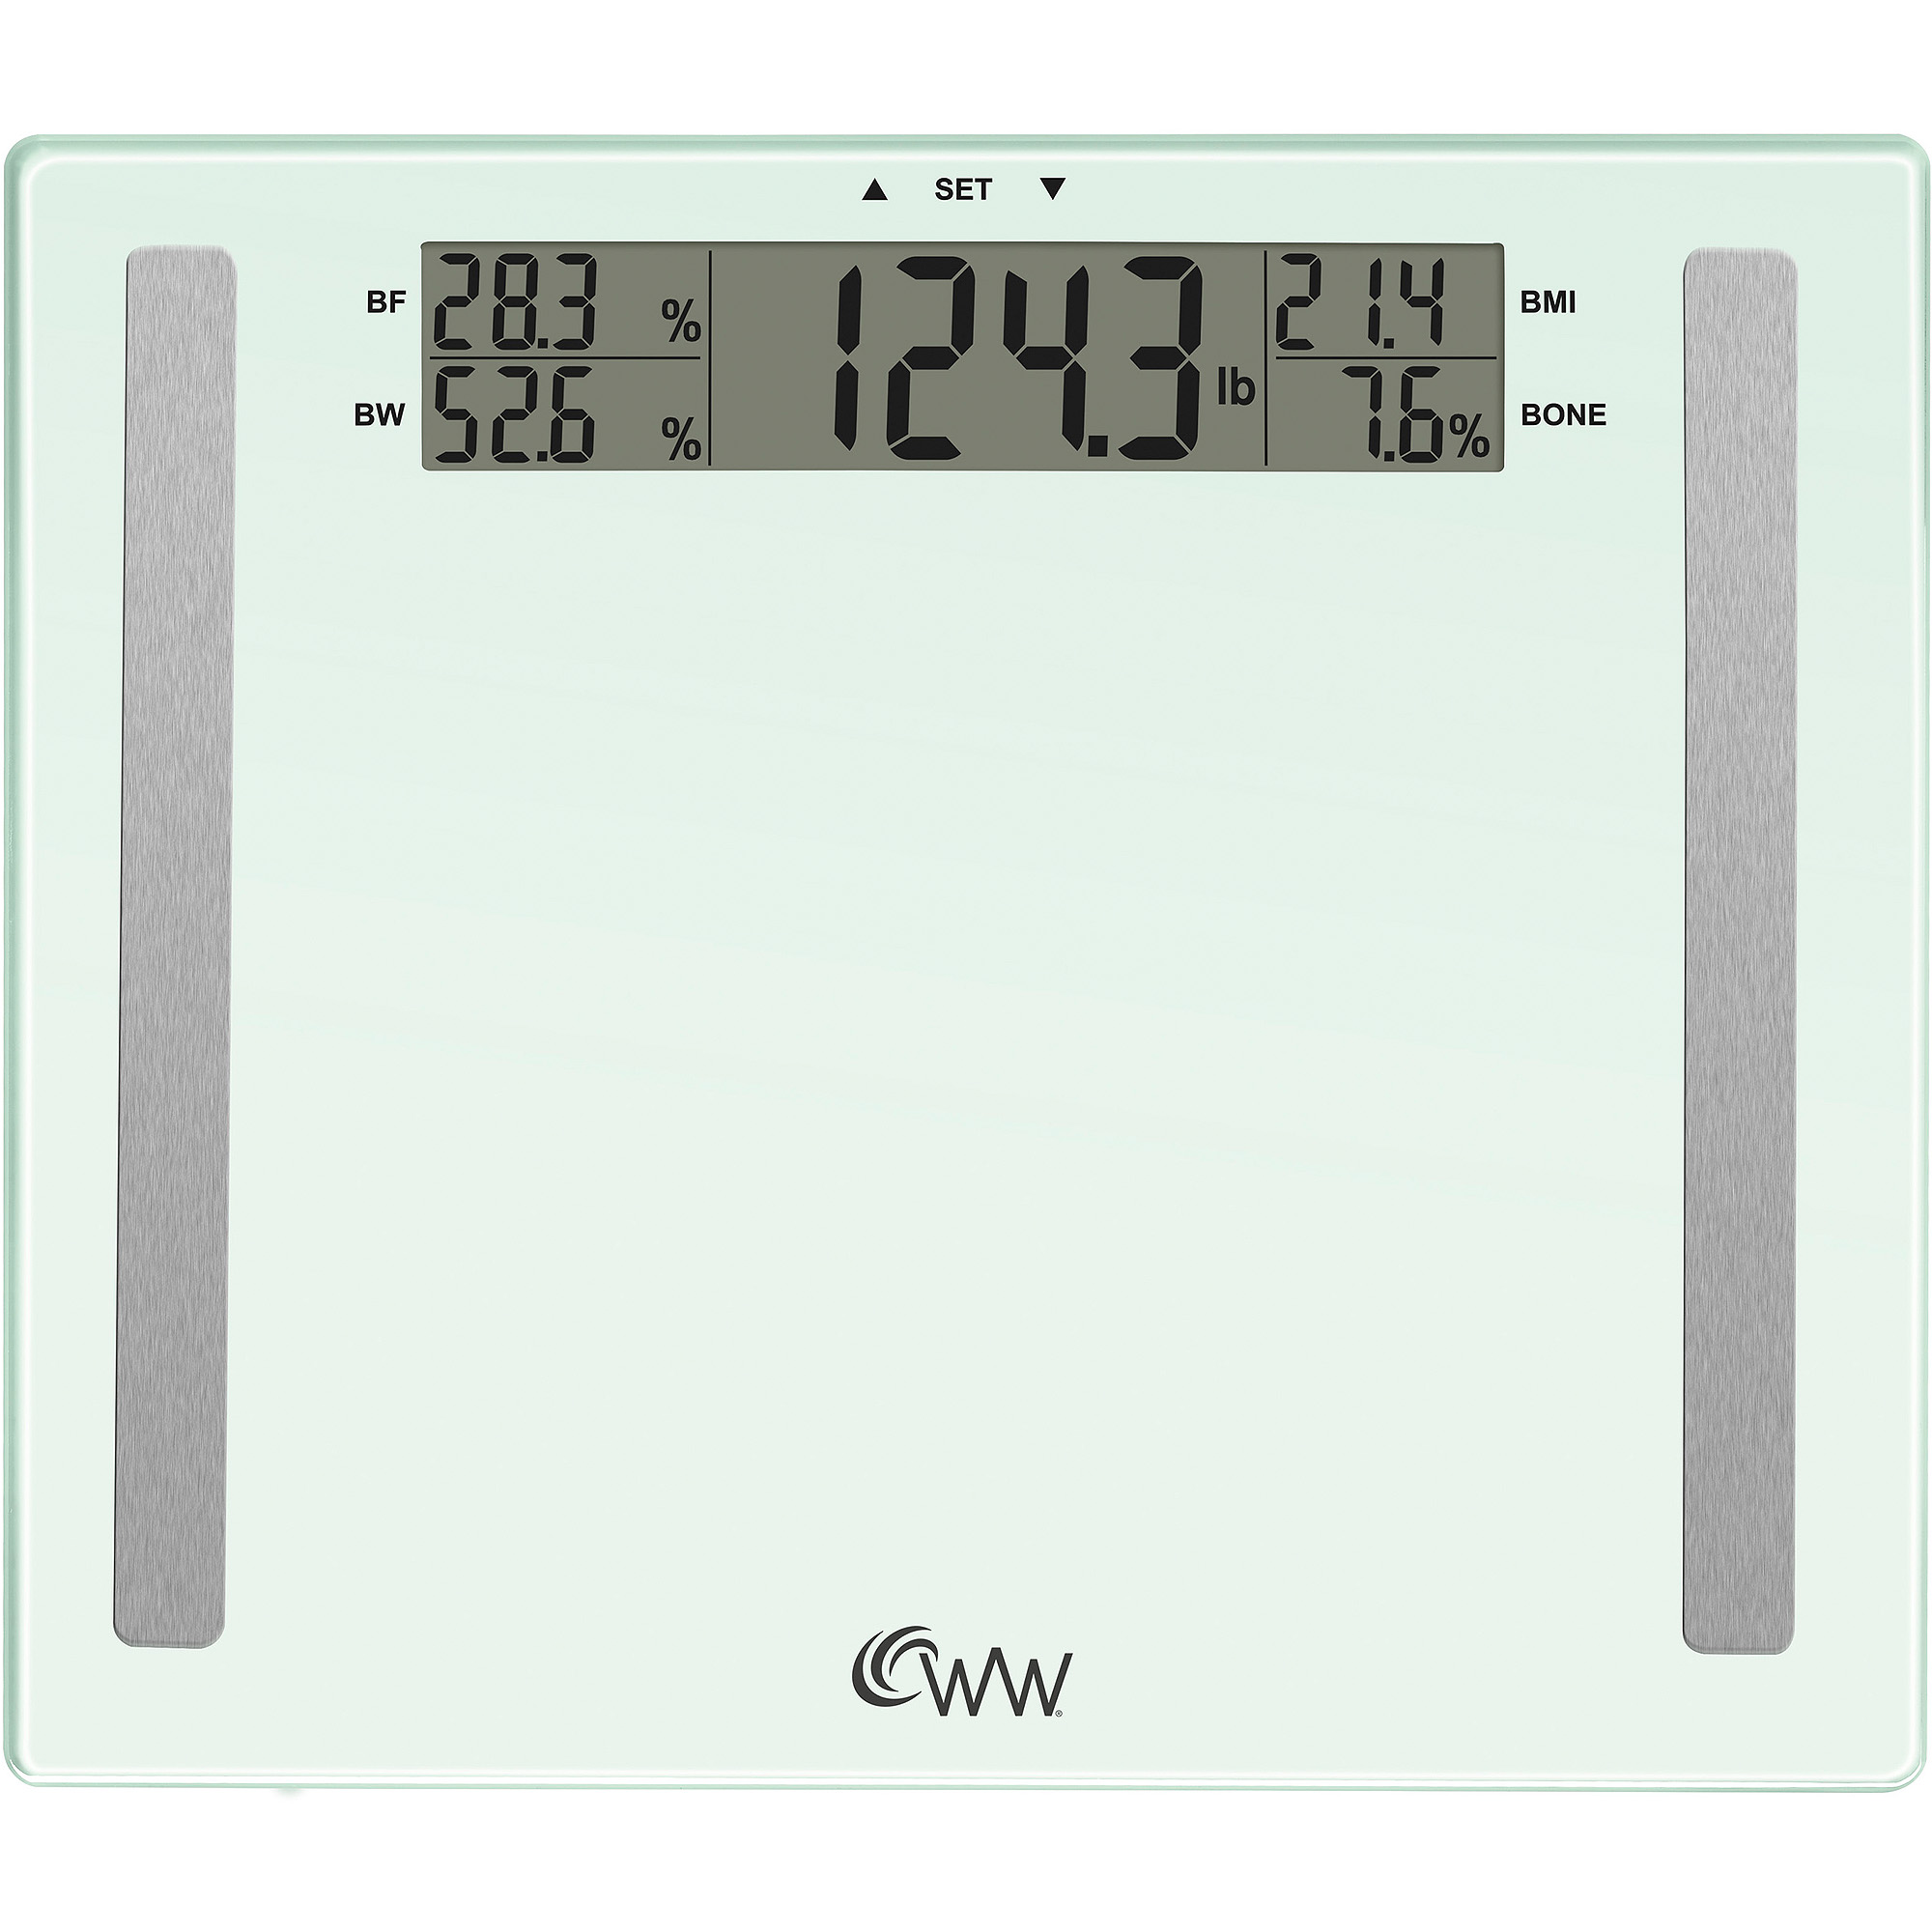 Weight watchers by conair user memory glass body analysis scale also rh walmart